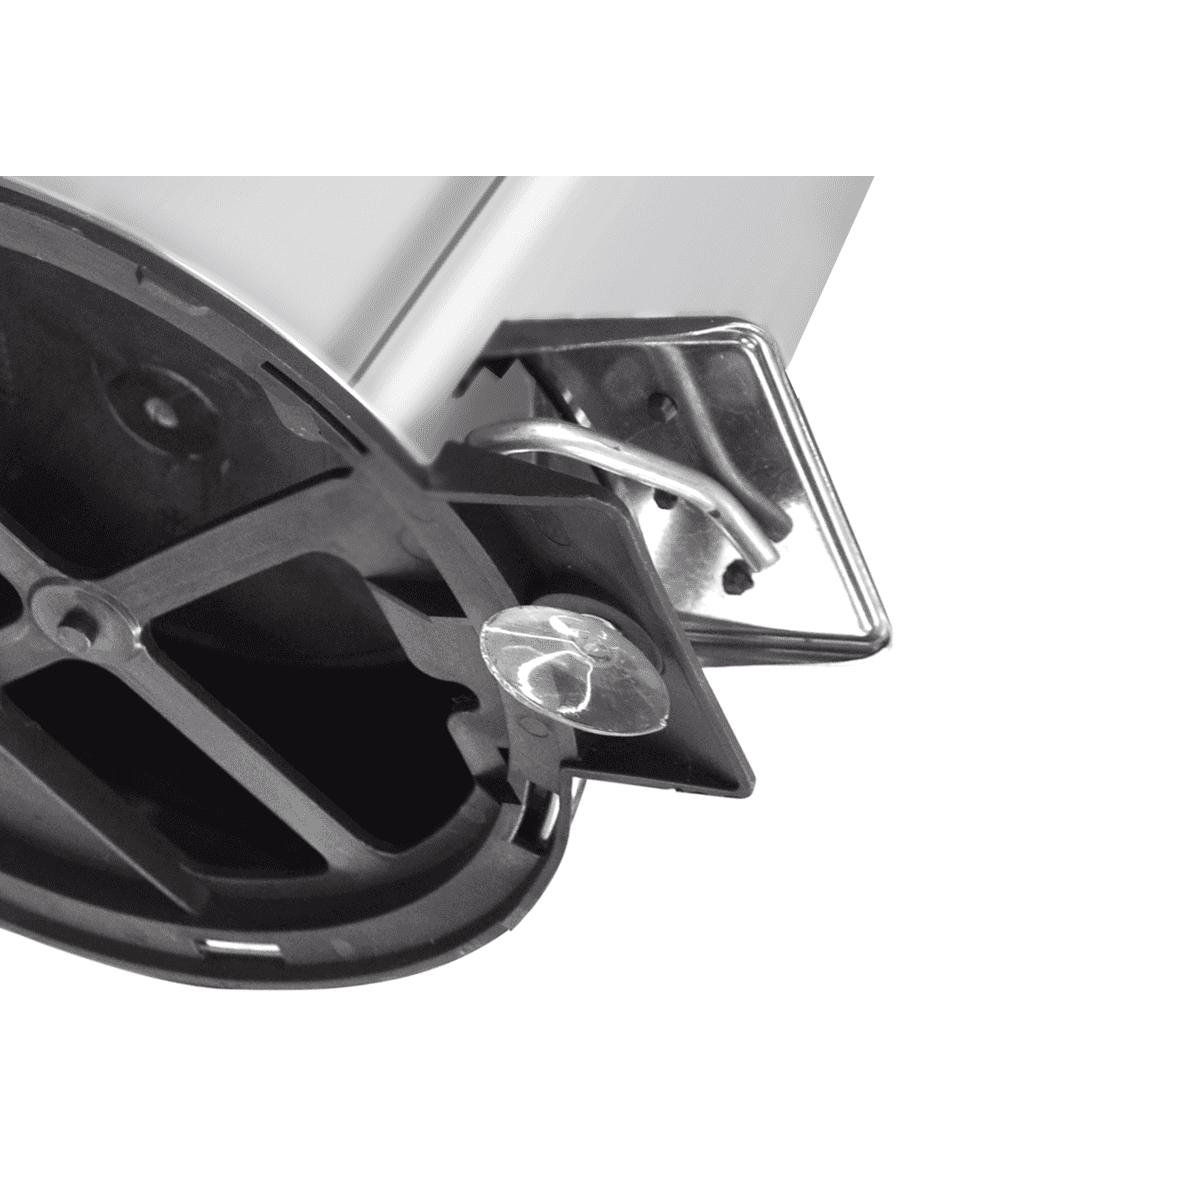 Lixeira Tramontina Inox com Pedal 94538/103 3LT  - Casa Mattos